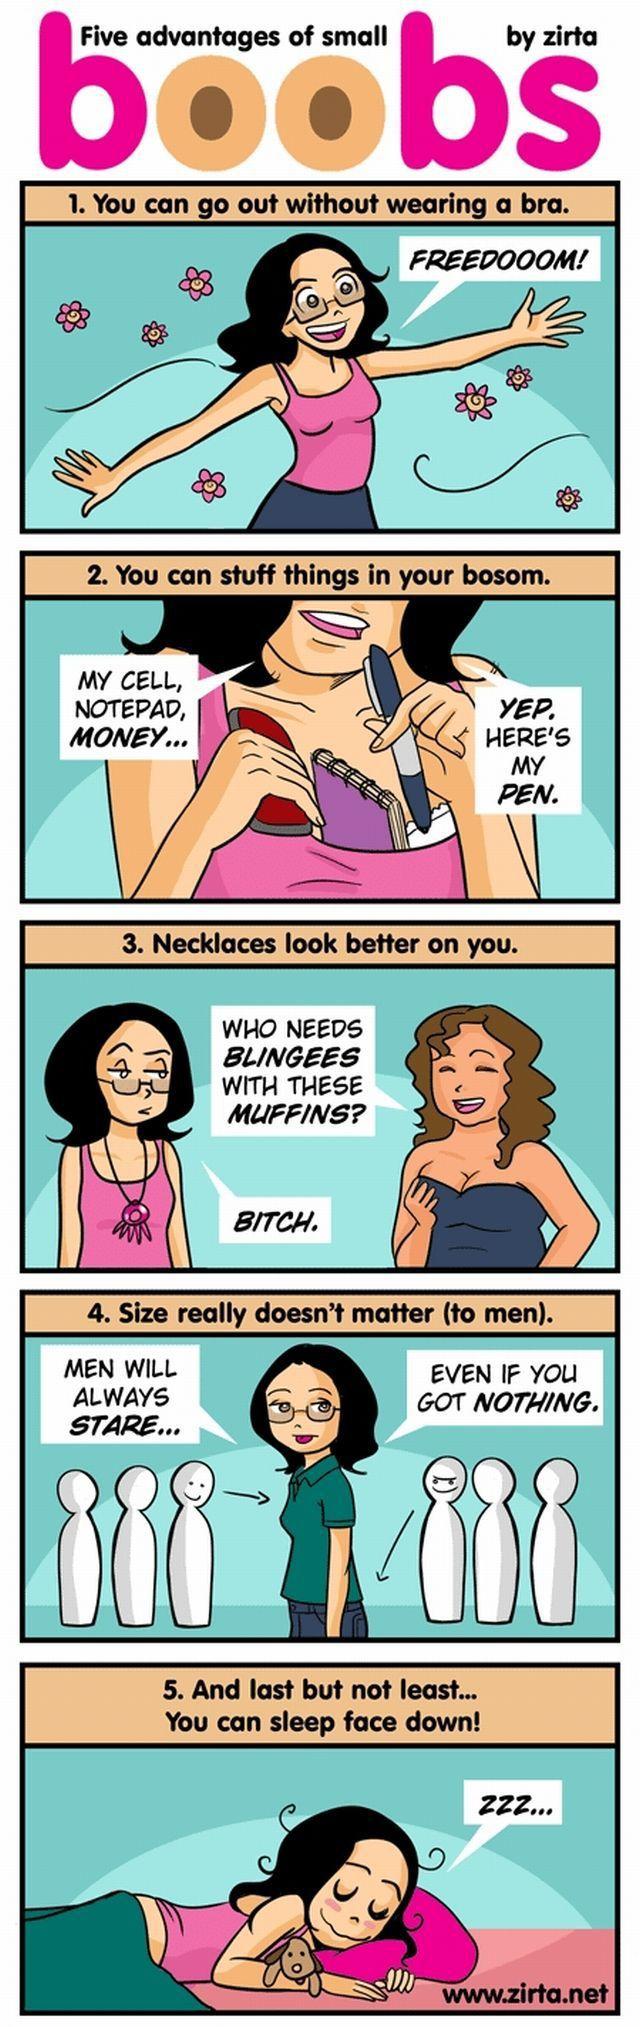 avantage-petits-seins